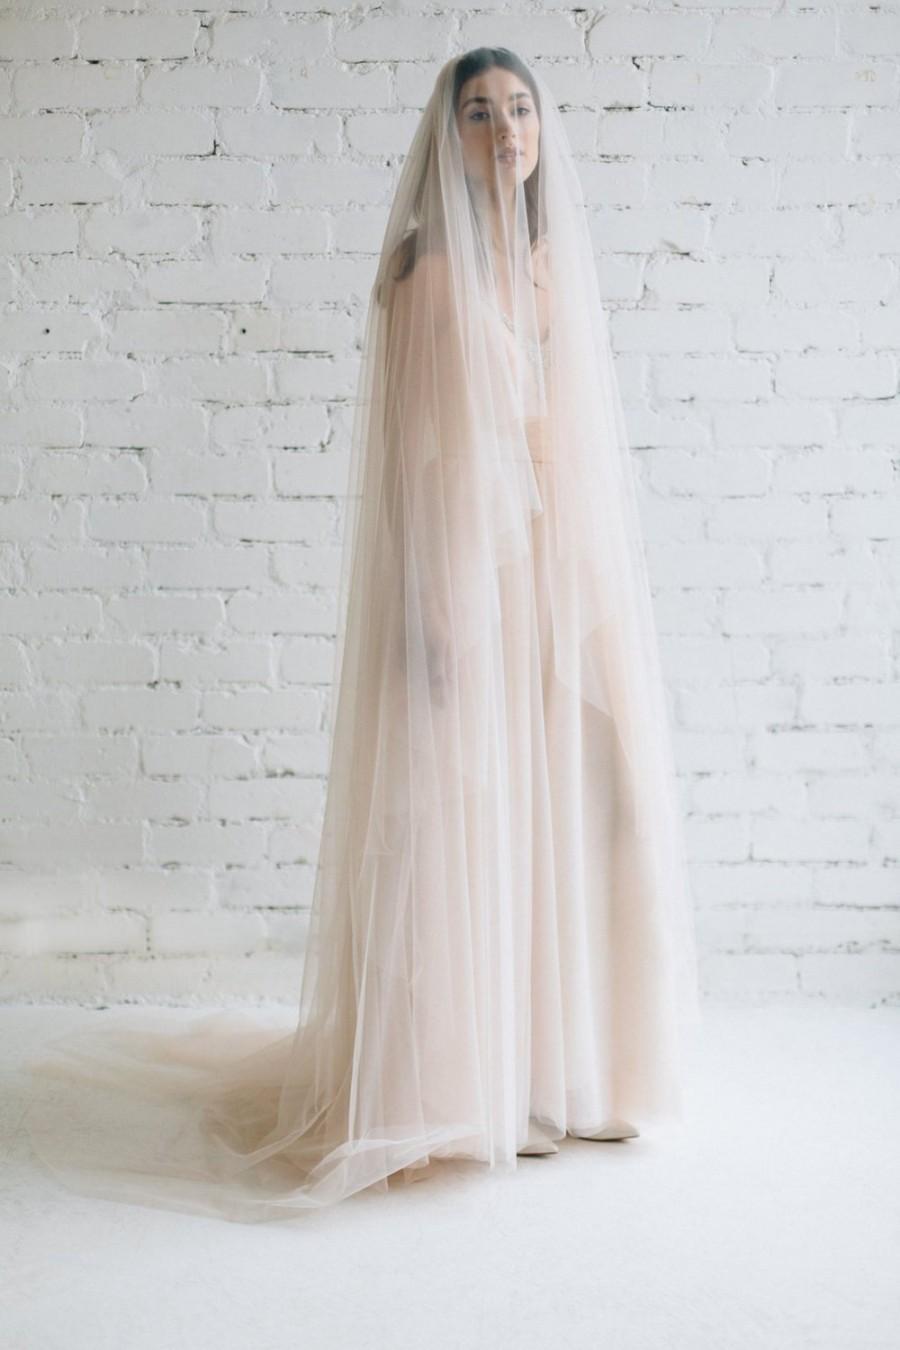 Свадьба - Blush Wedding Veil, Cathedral Veil , Wide Tulle Veil, Veil with Blusher ,Circle Drop Veil, Blusher Veil, Long Tulle Veil -  JULIA